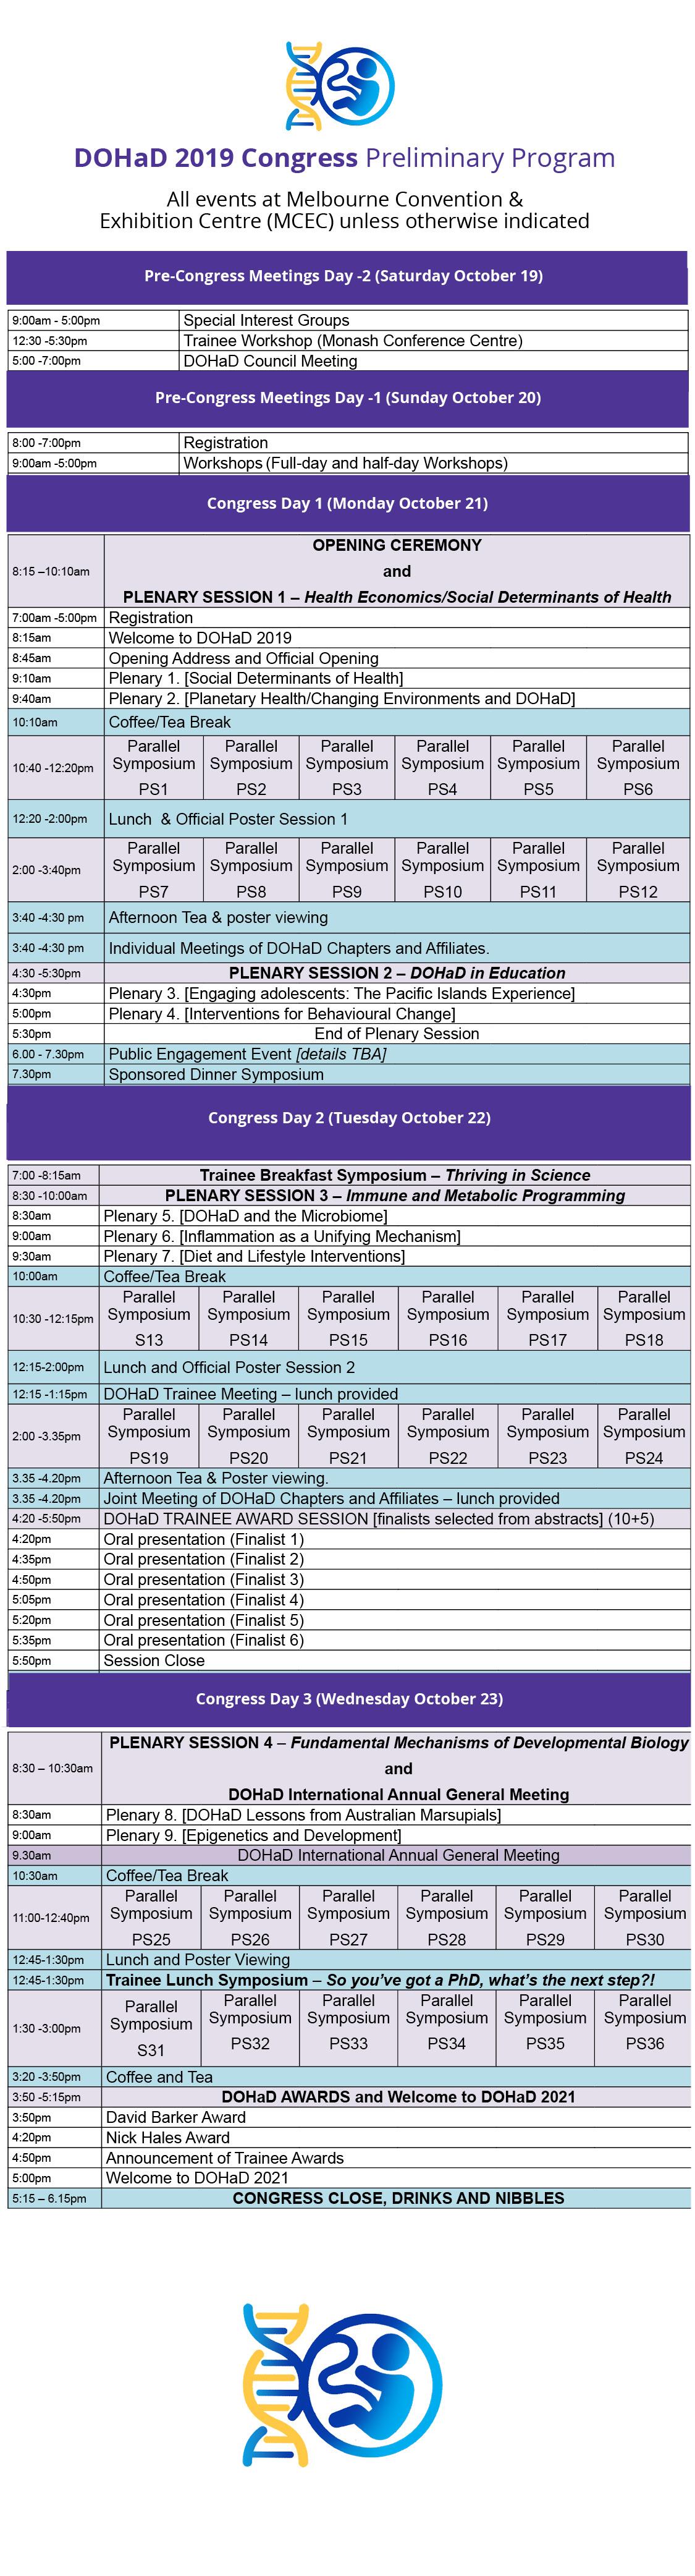 DOHaD-2019-Congress-Purple-29-07-19